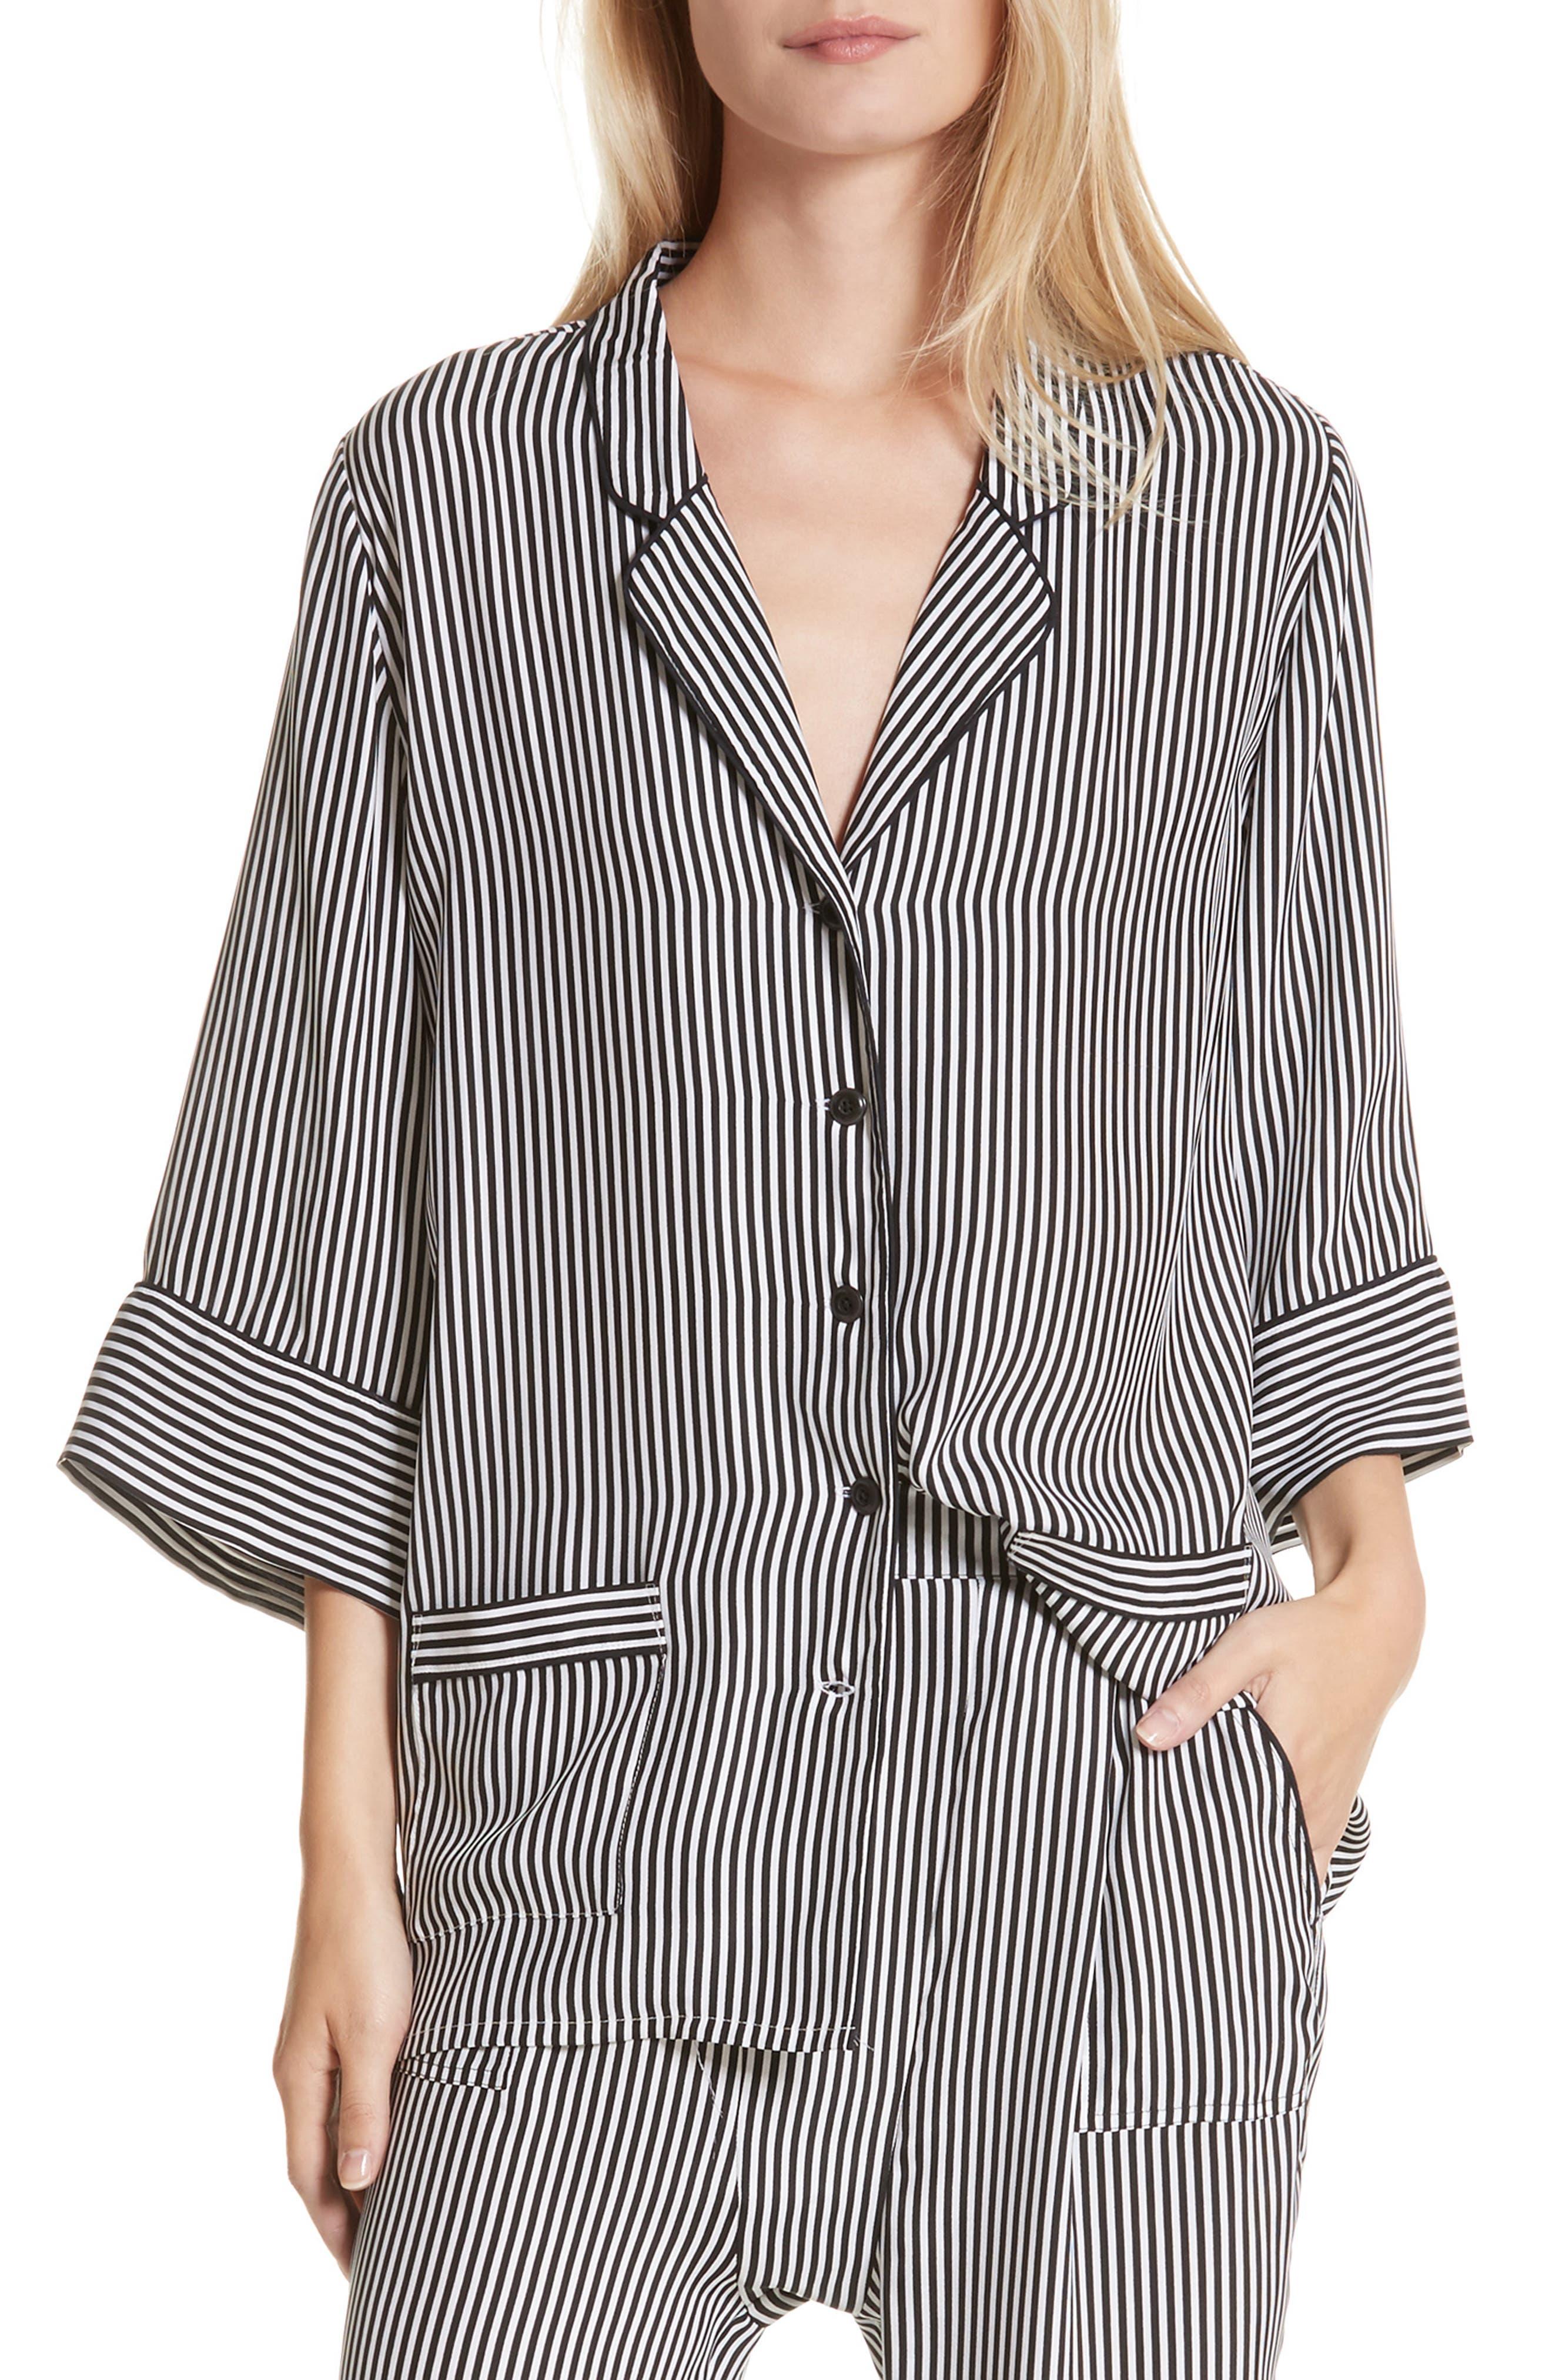 Alternate Image 1 Selected - THE GREAT. Pencil Stripe Silk Sleeper Shirt